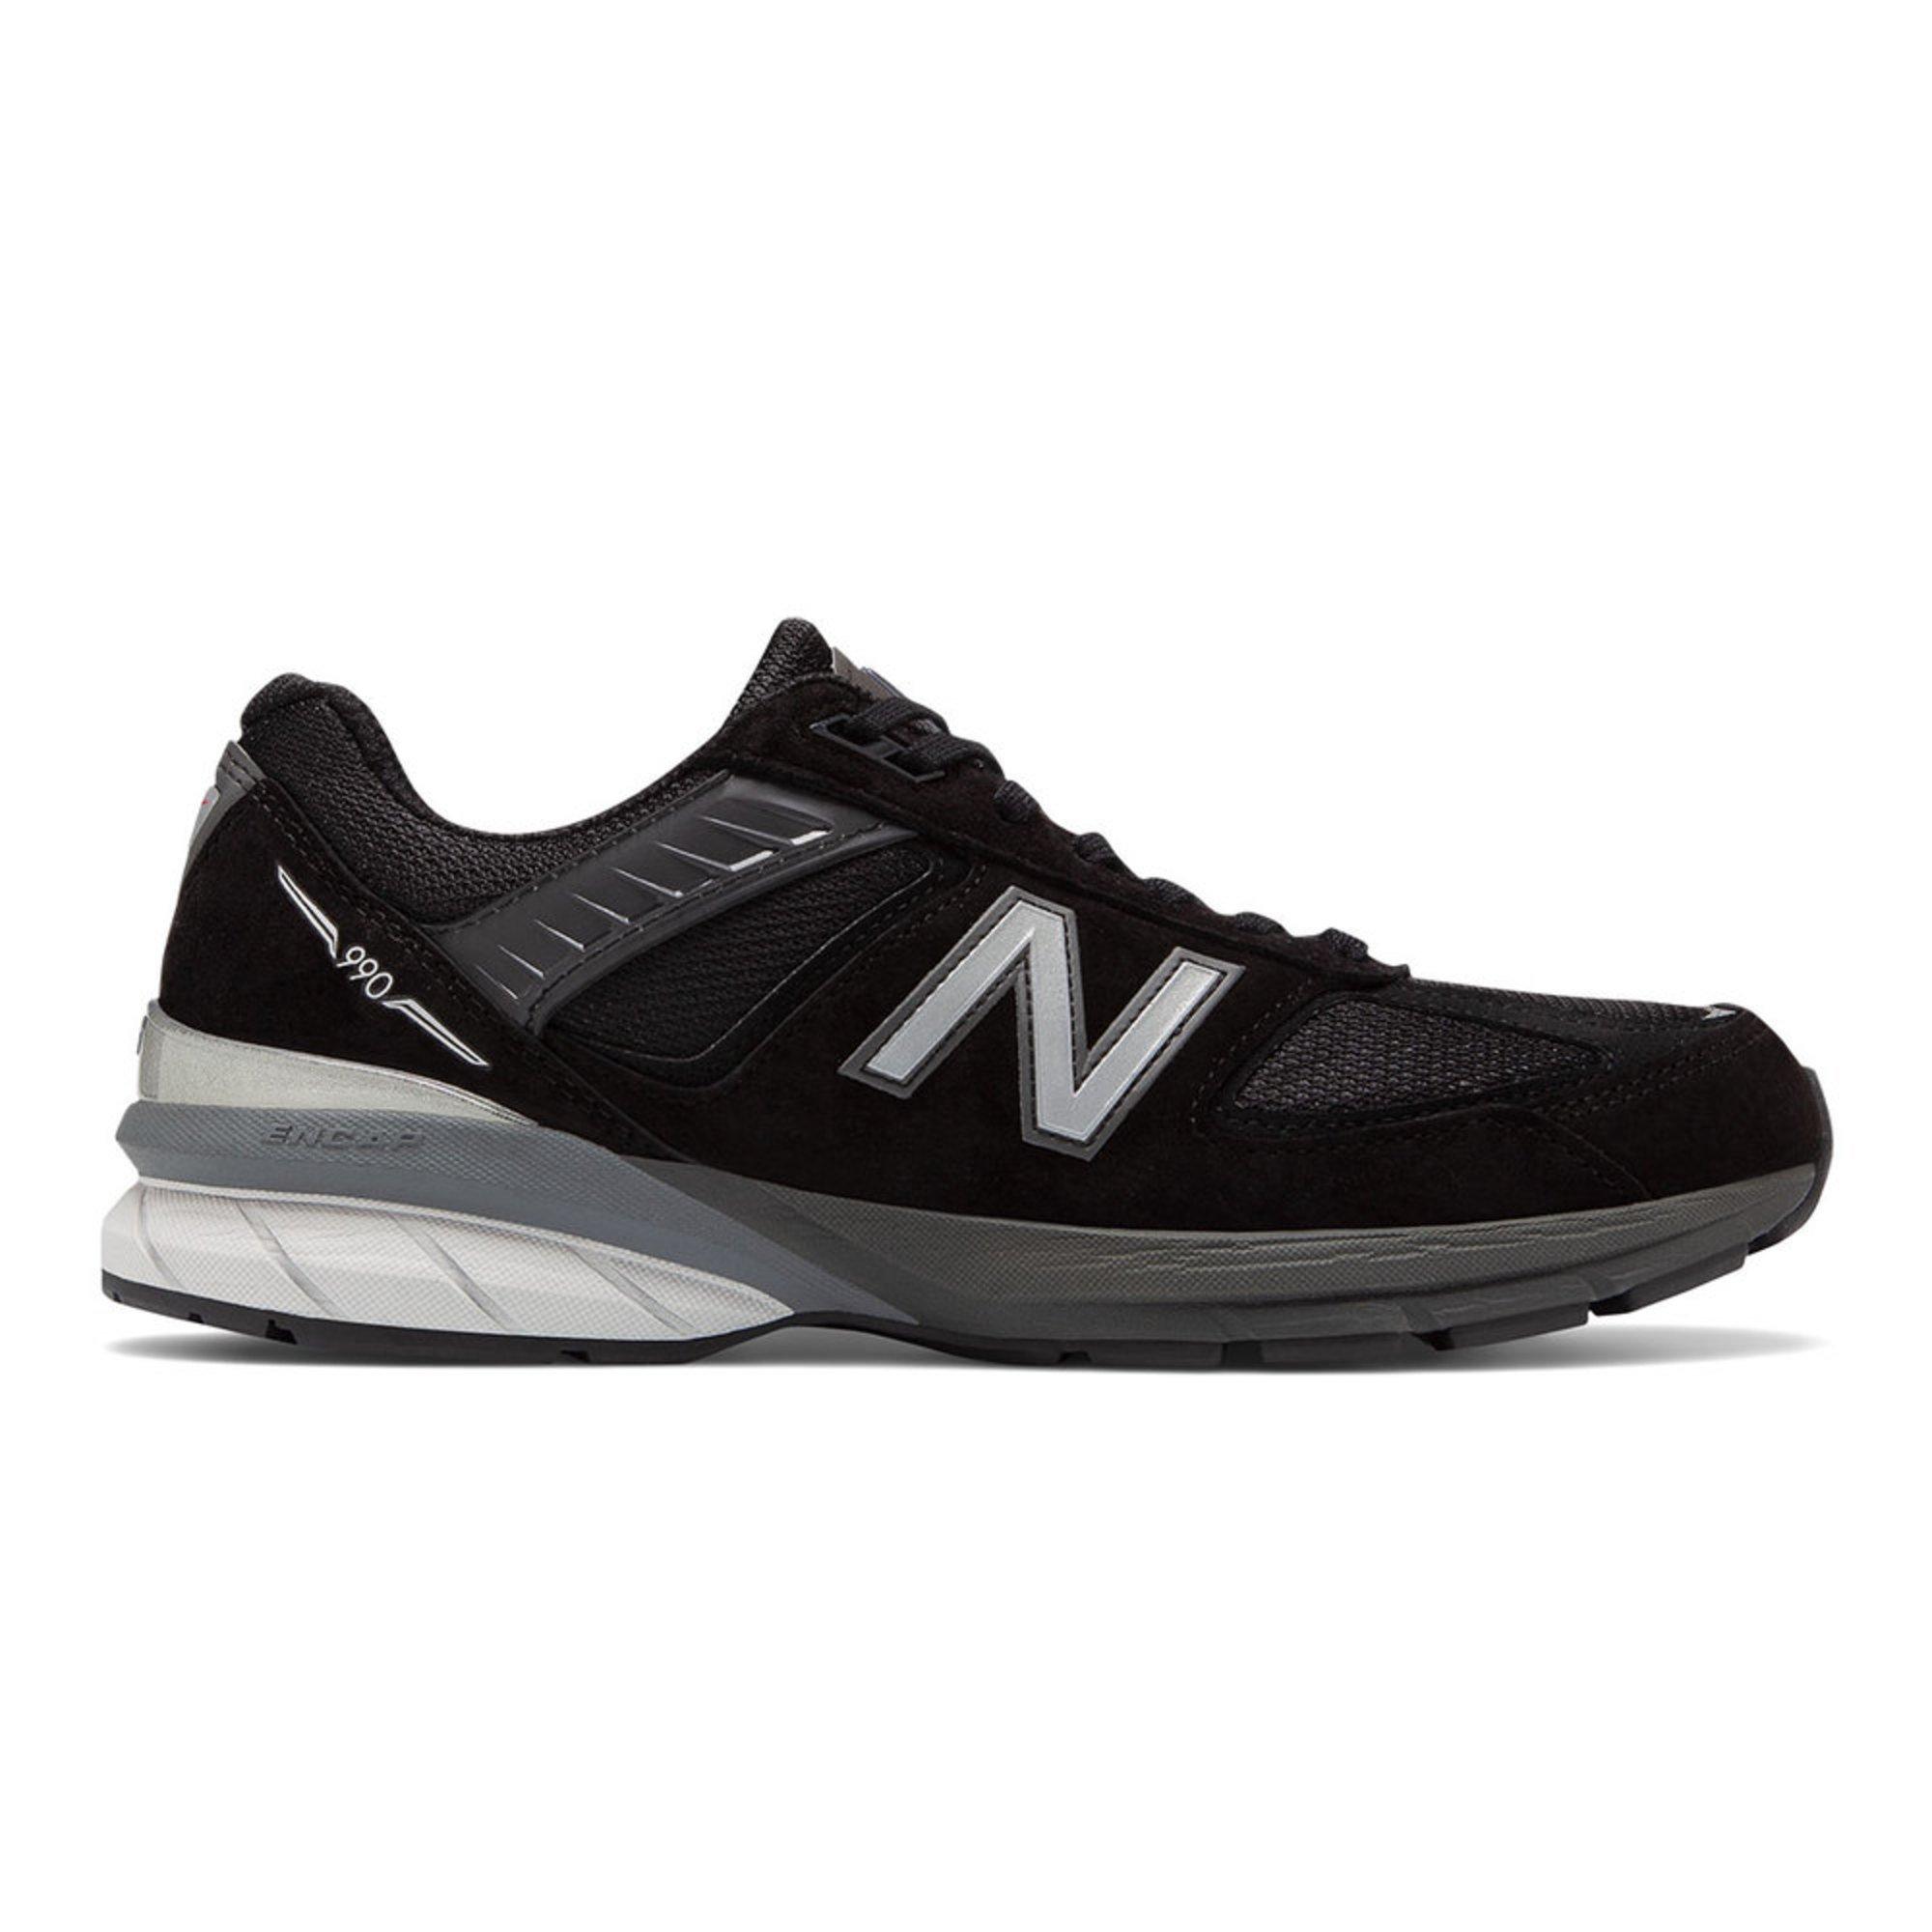 970a25b81f3b5 New Balance Men's 990v5 Lifestyle Running Shoe   Men's Running Shoes ...